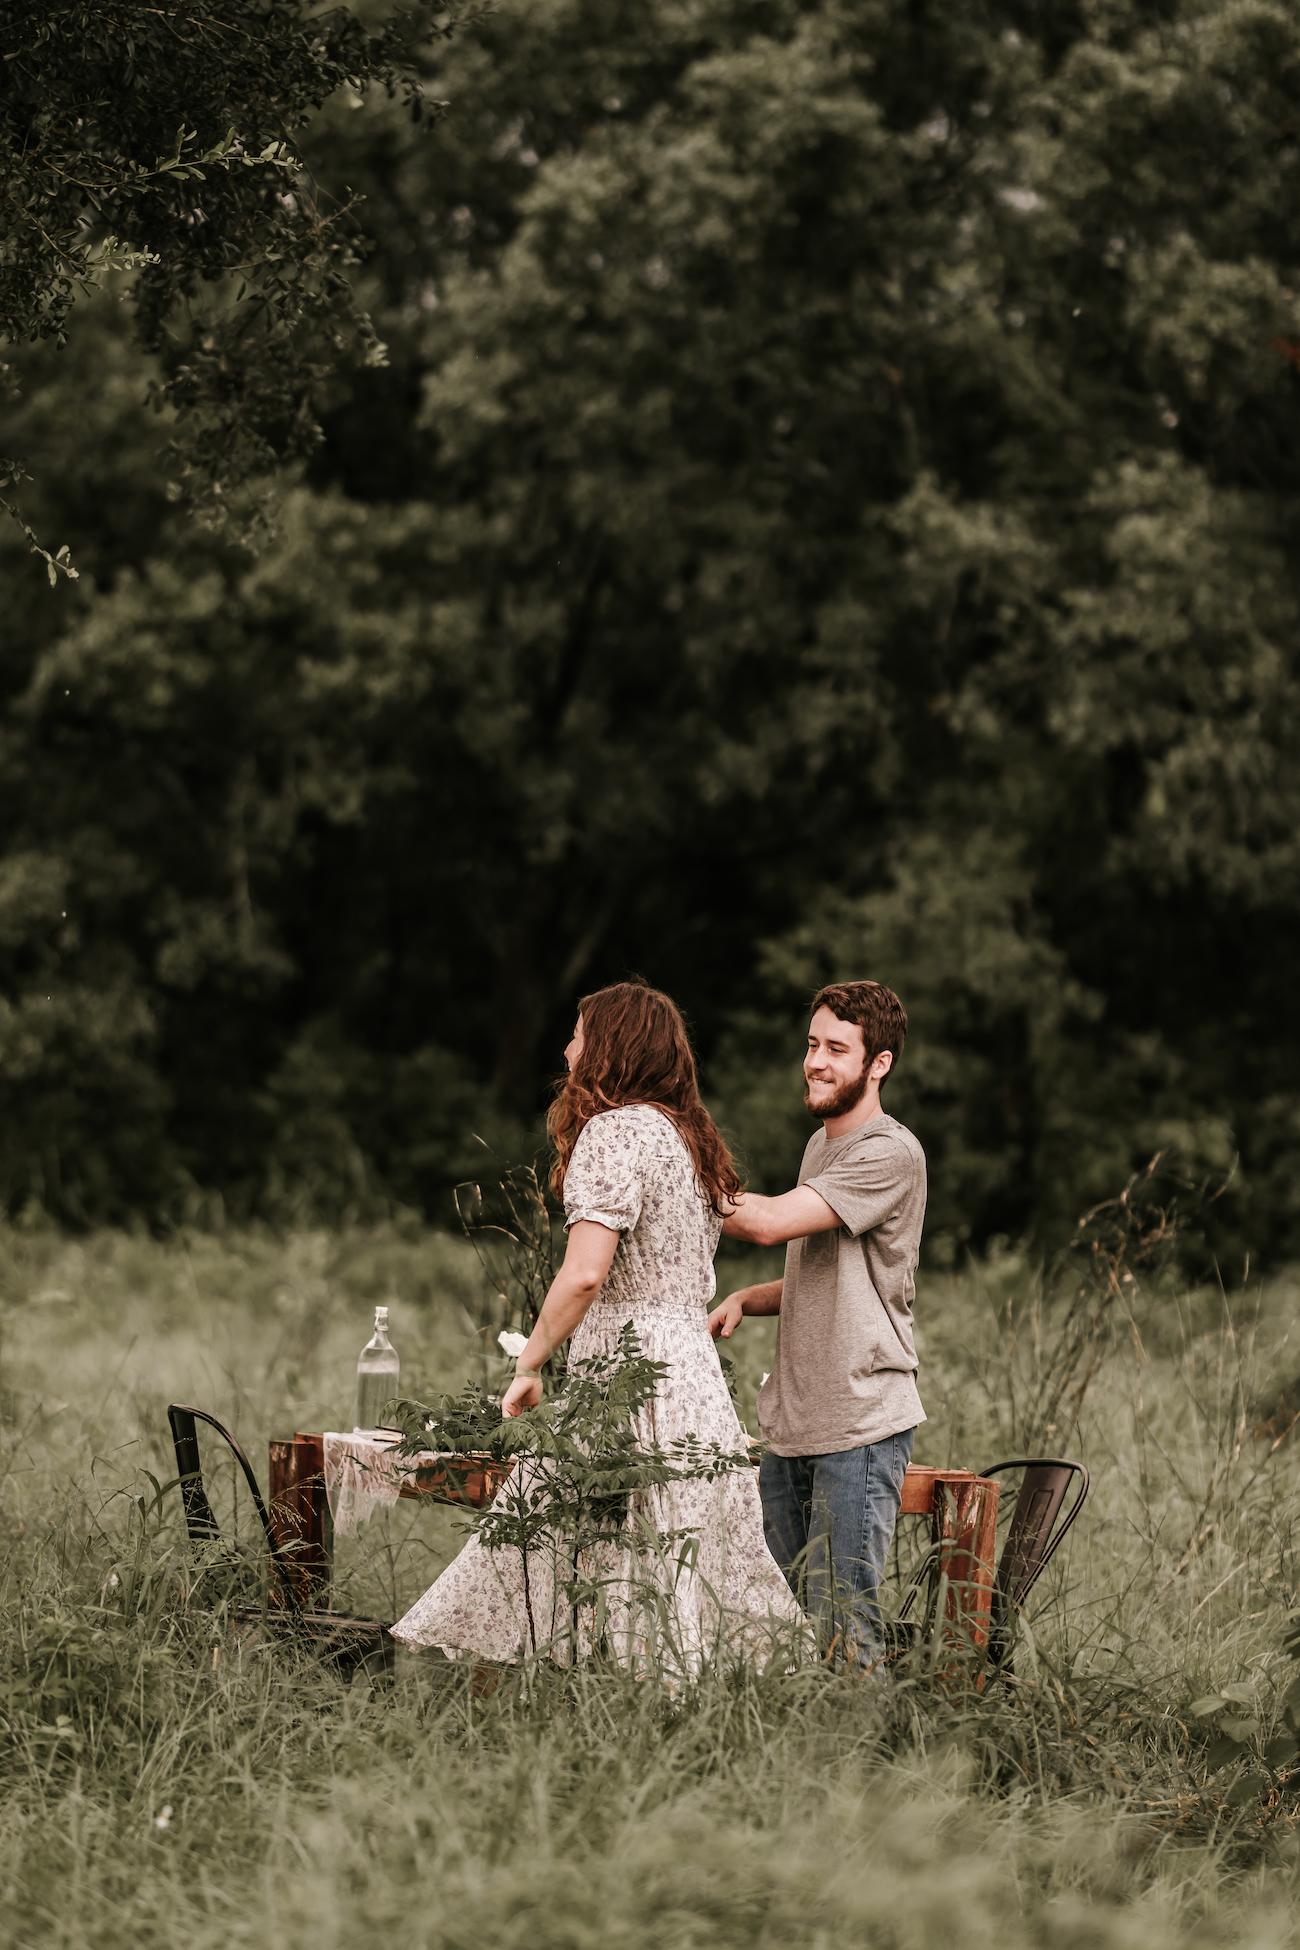 tampa-engagement-proposal-photography-67.jpeg